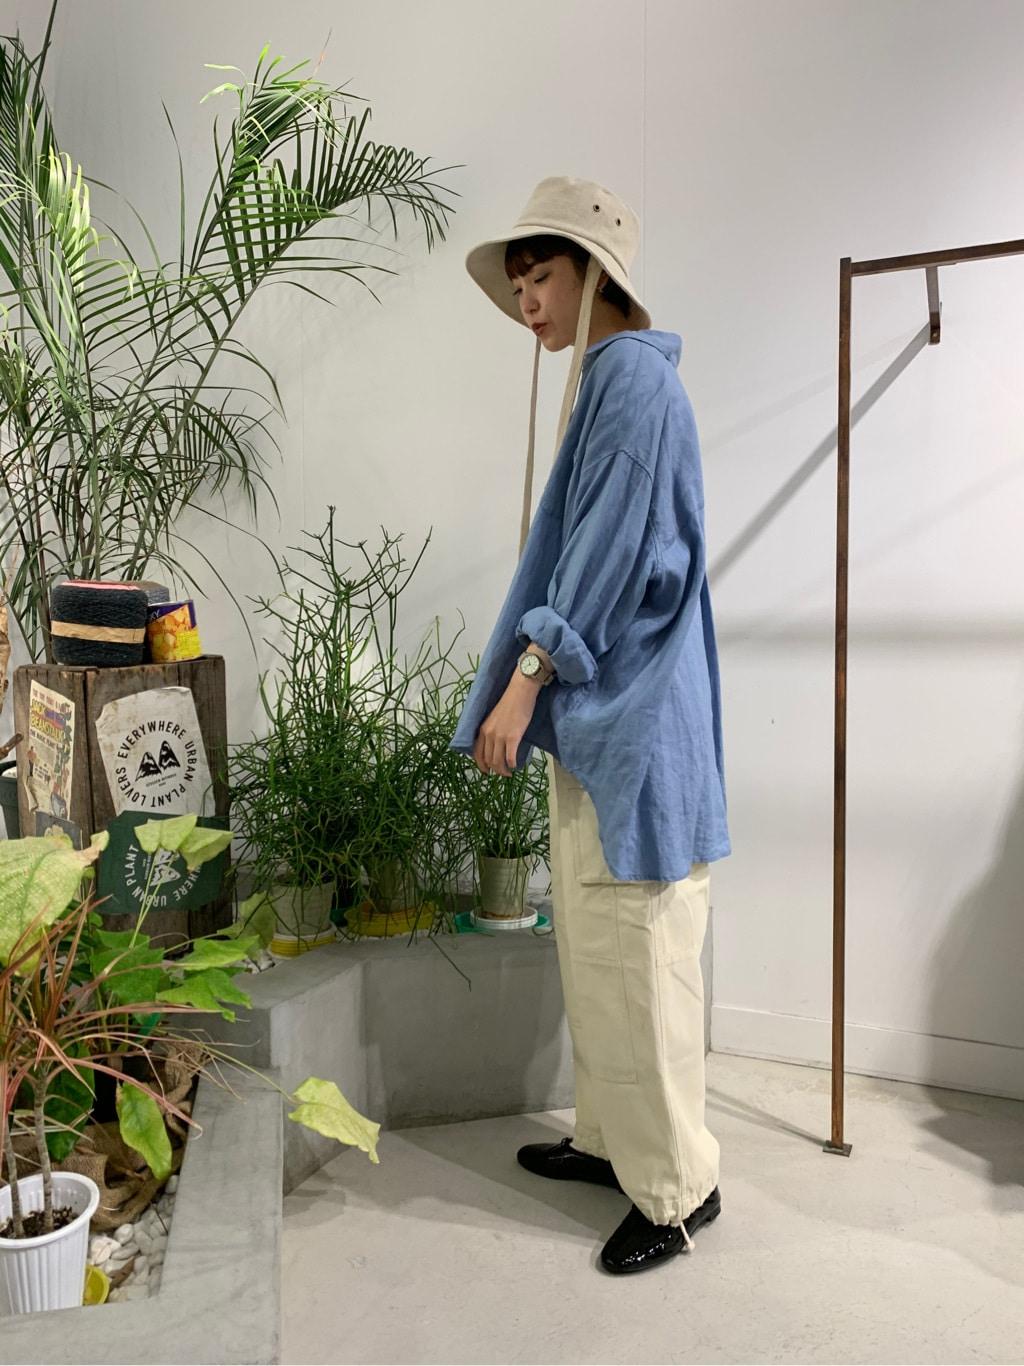 l'atelier du savon 名古屋栄路面 身長:161cm 2020.06.29